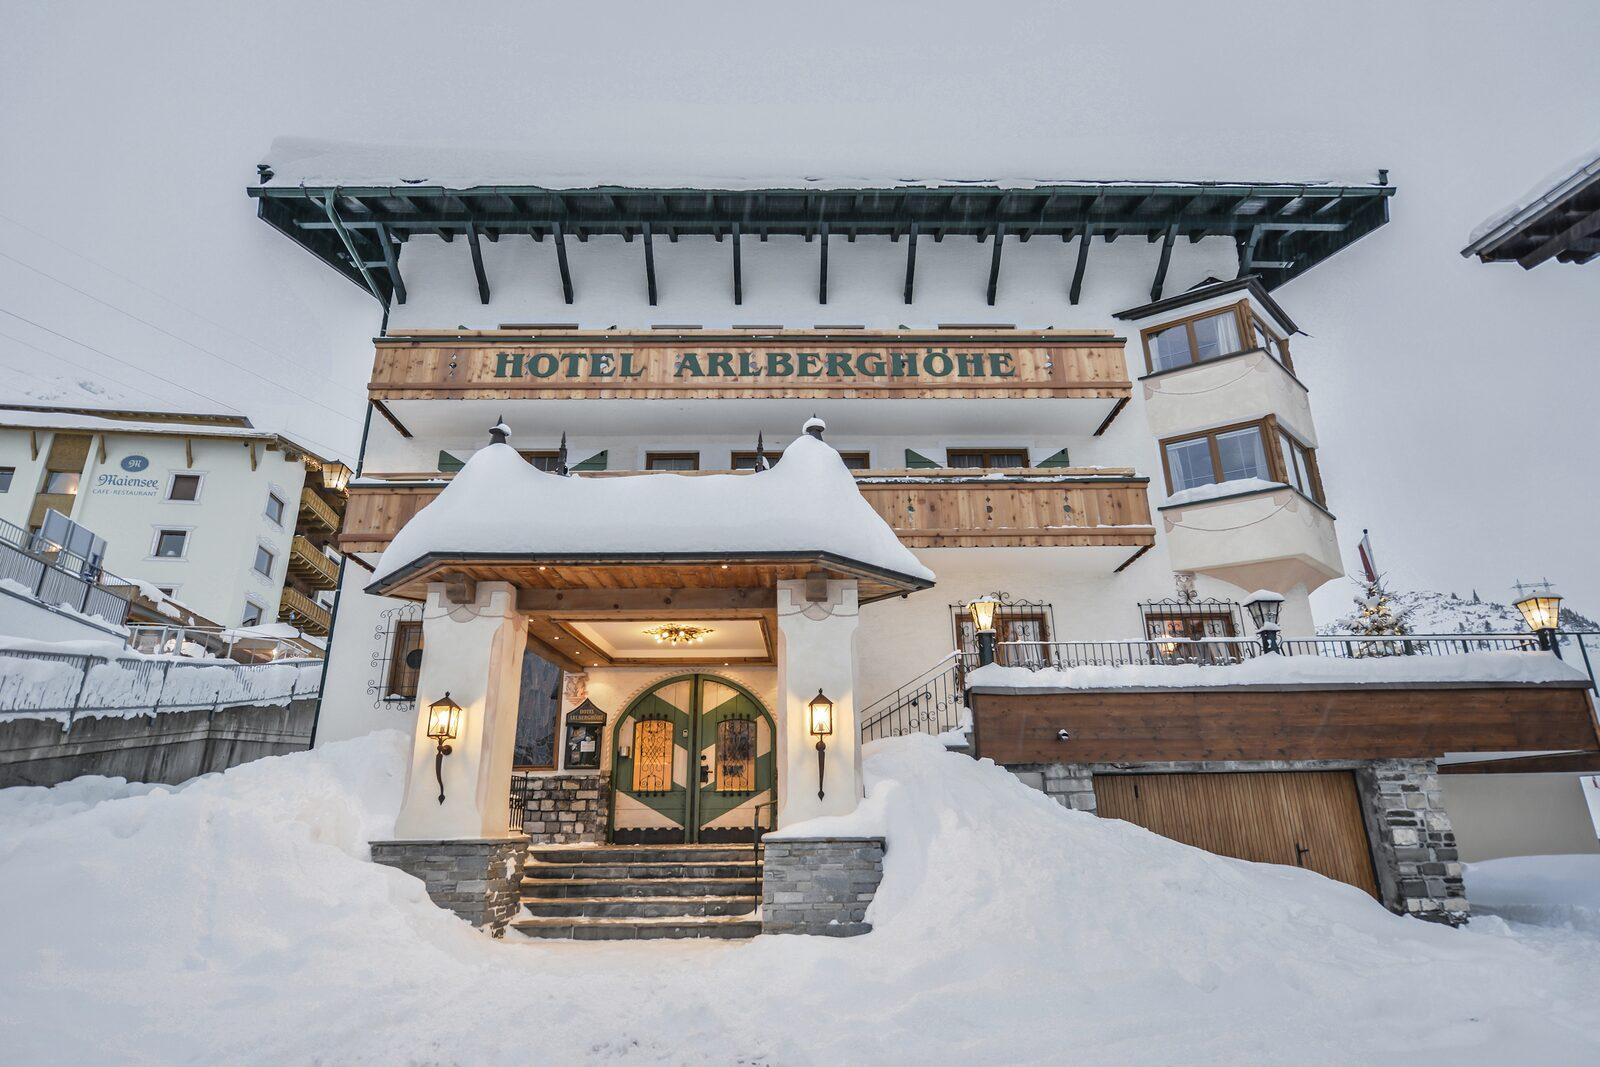 Hotel Arlberghöhe | Unbegrenzter Wintersportgenuss in Tirol